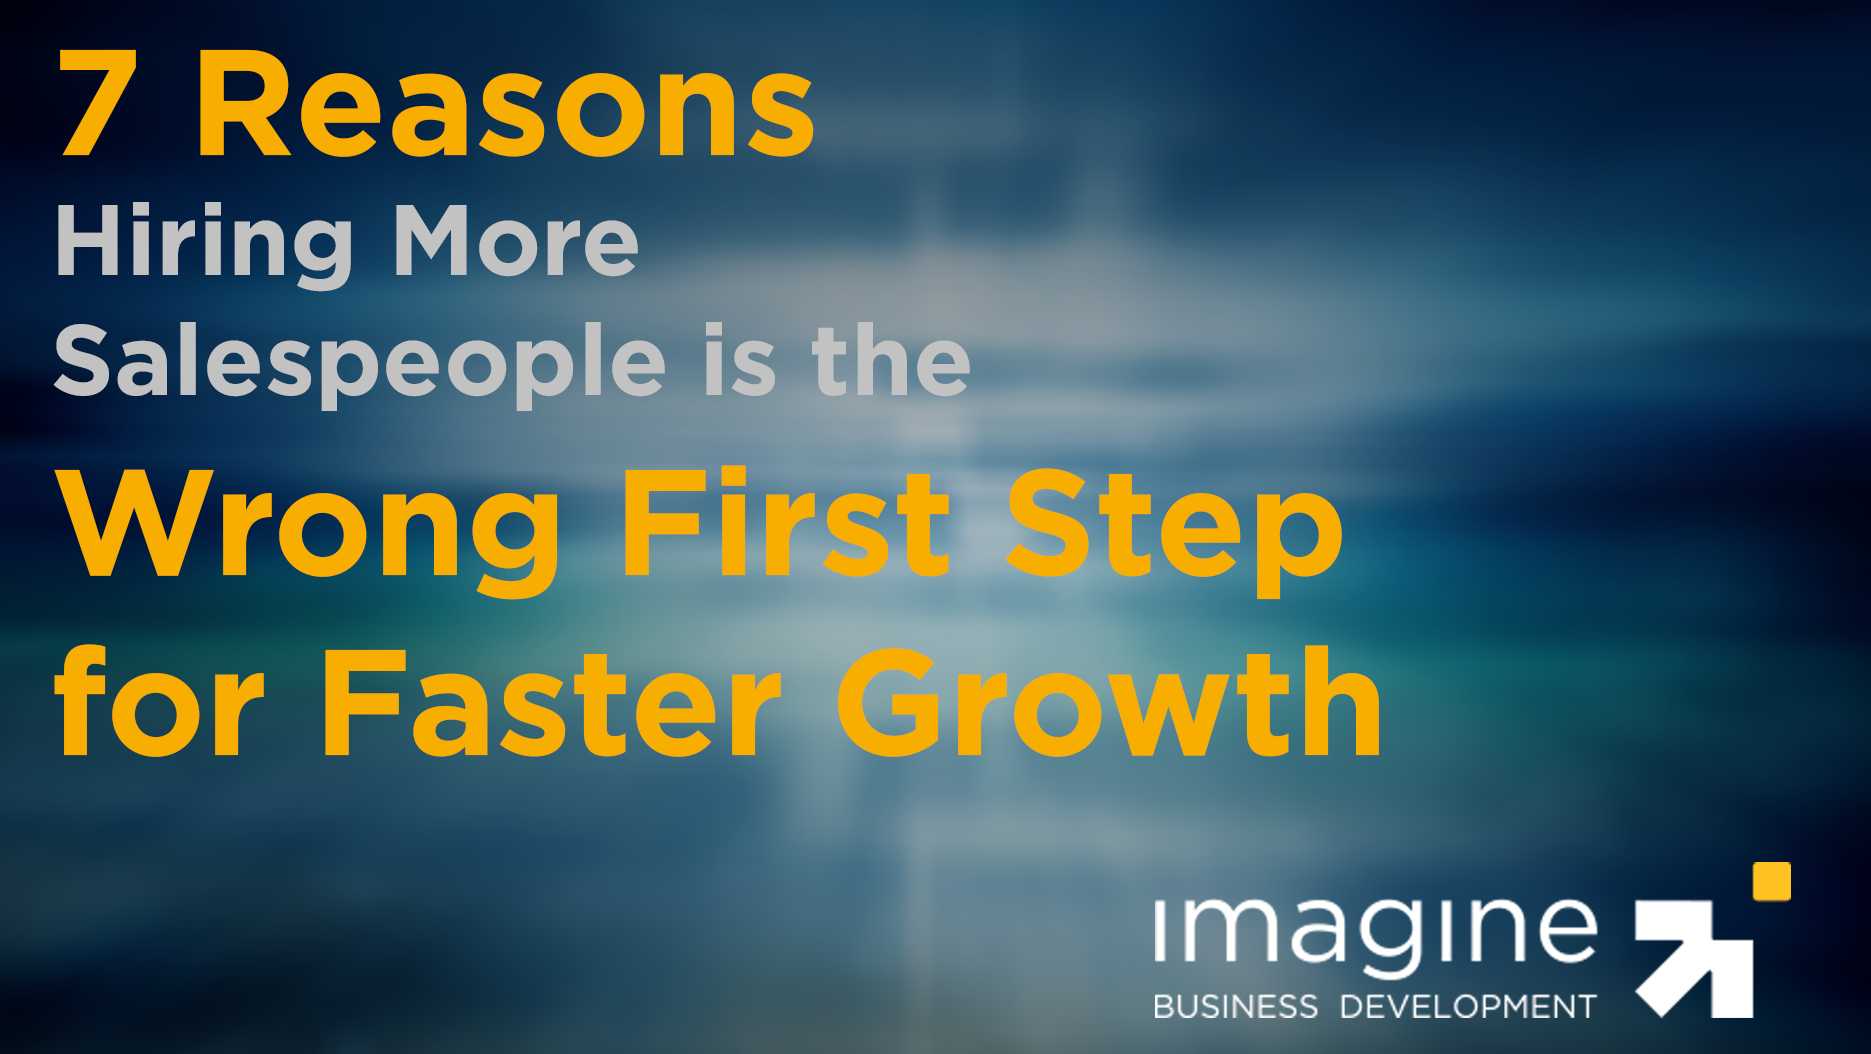 7-reasons-hiring-more-salespeople-cta